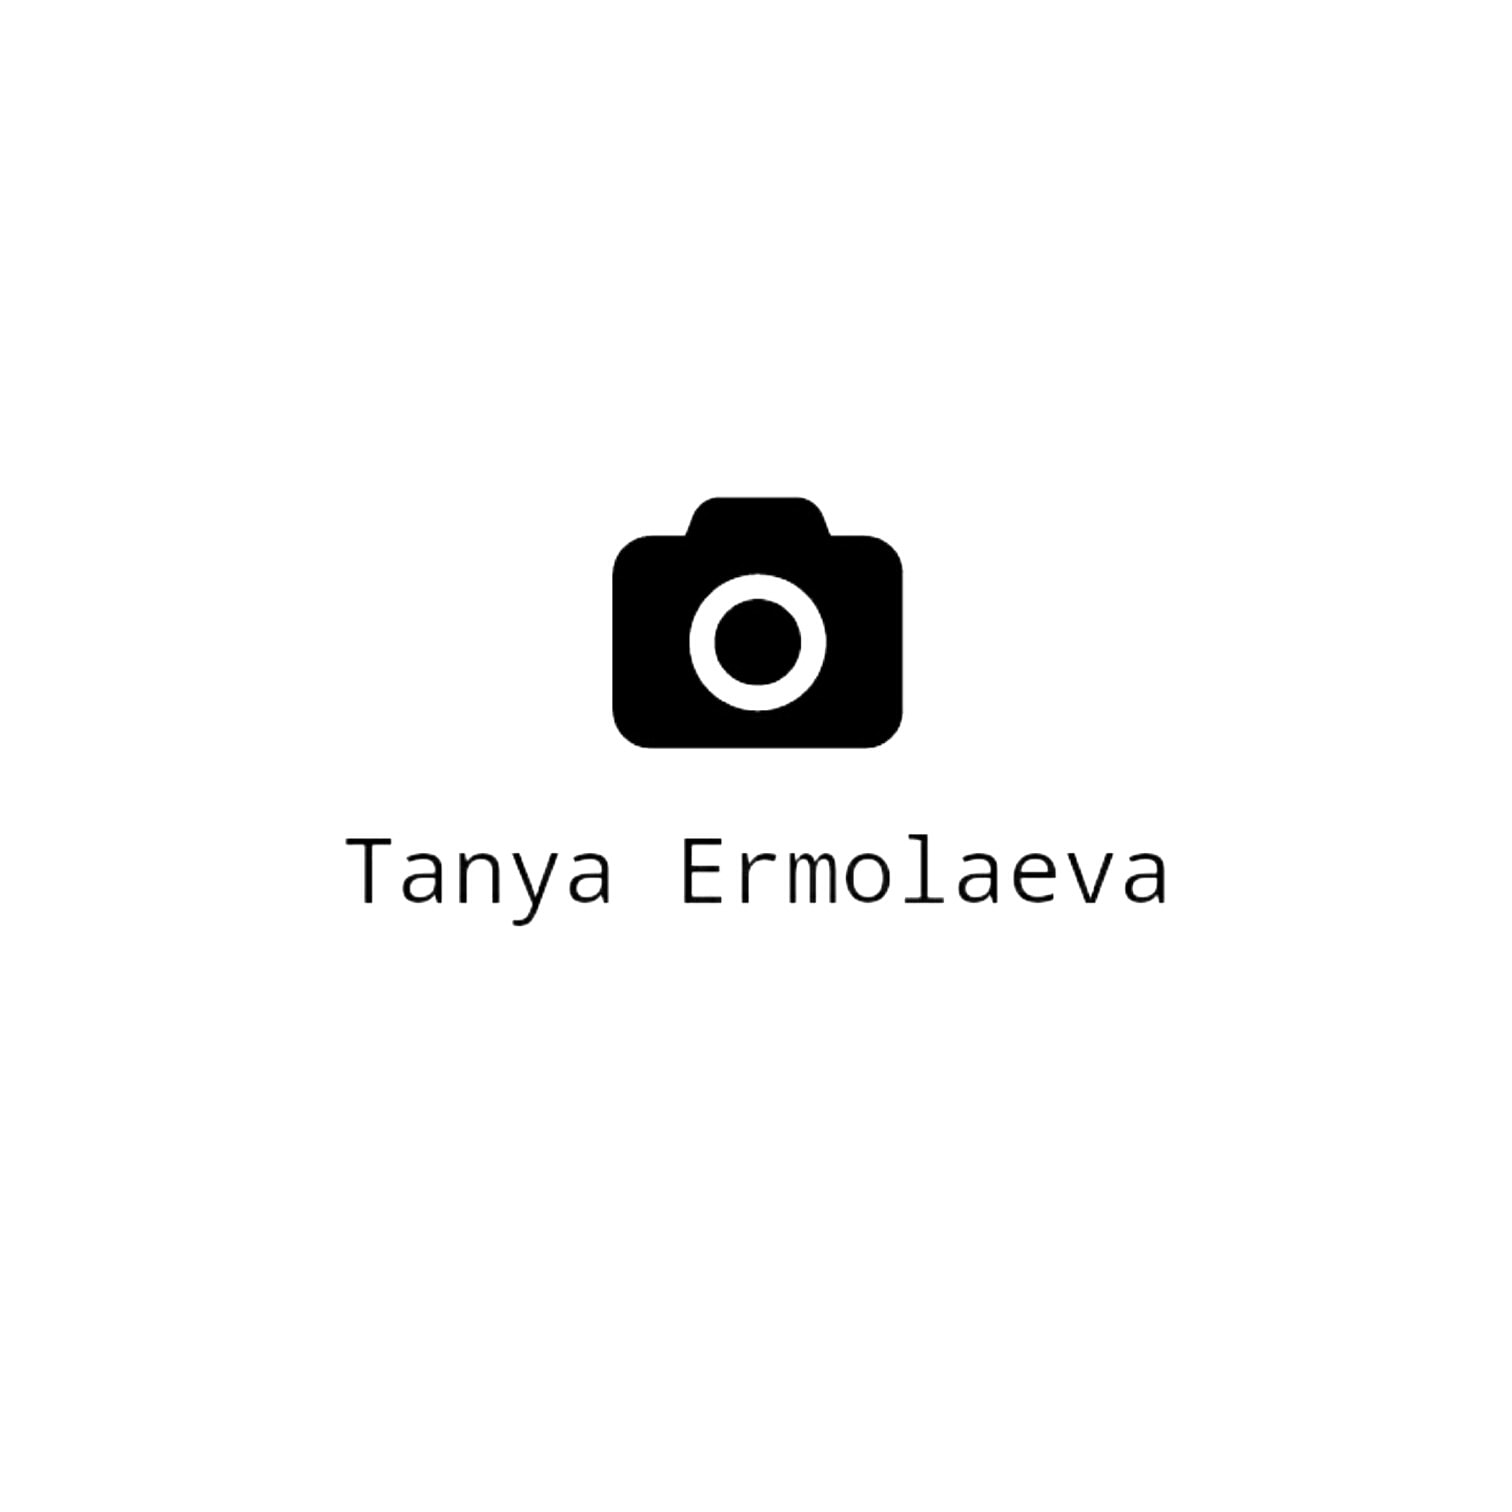 Go to Tanya Ermolaeva's profile